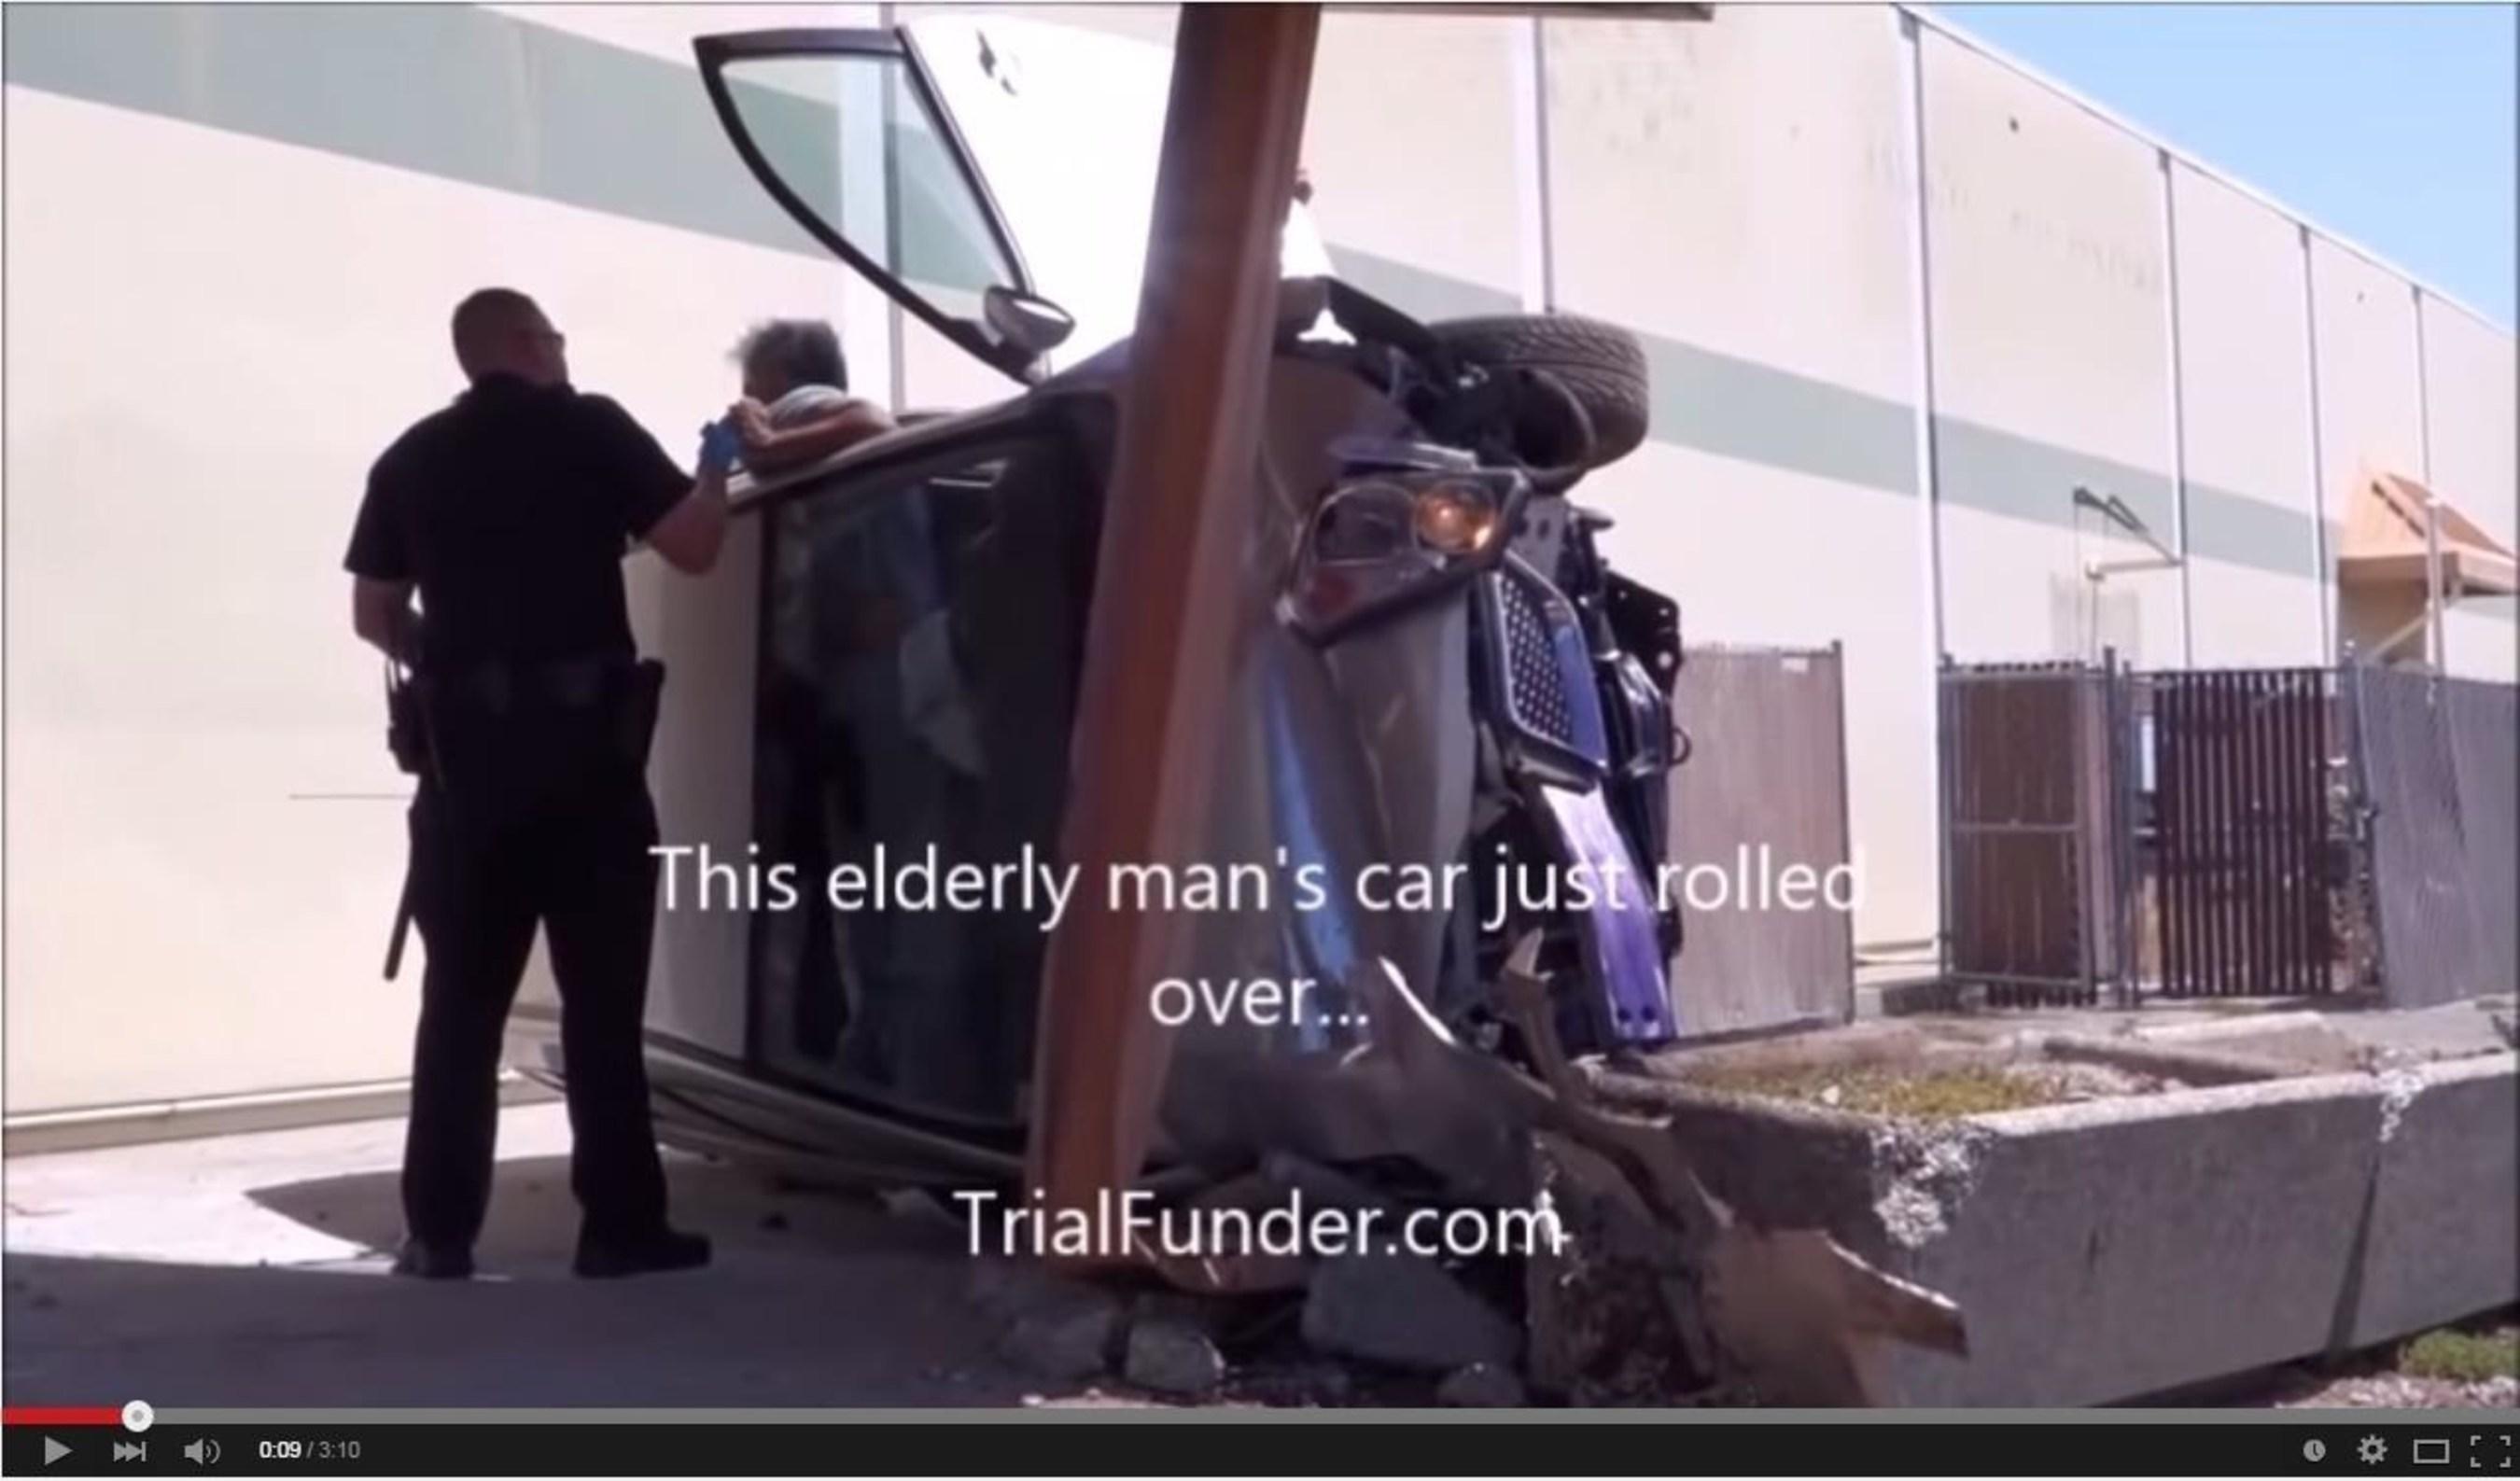 Police brutality case, Rosales v. City of Chico